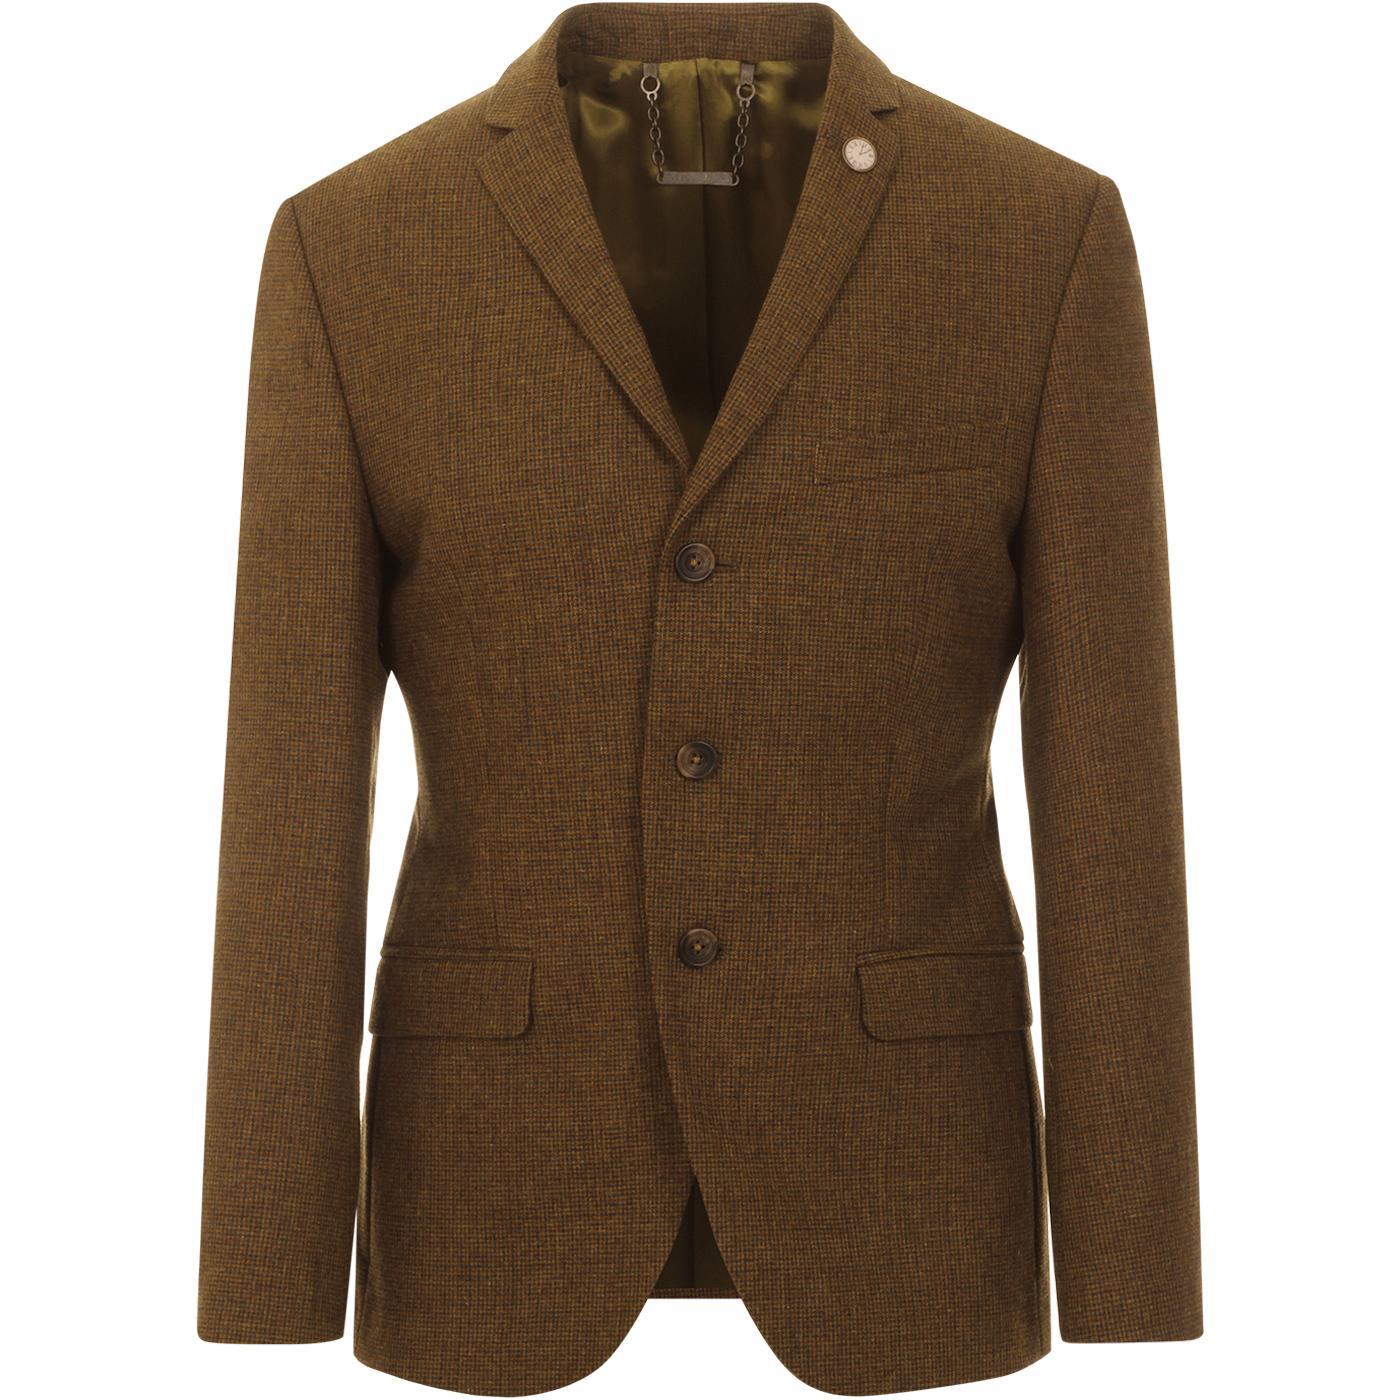 GIBSON LONDON Mod Puppytooth 3 Button Suit Blazer